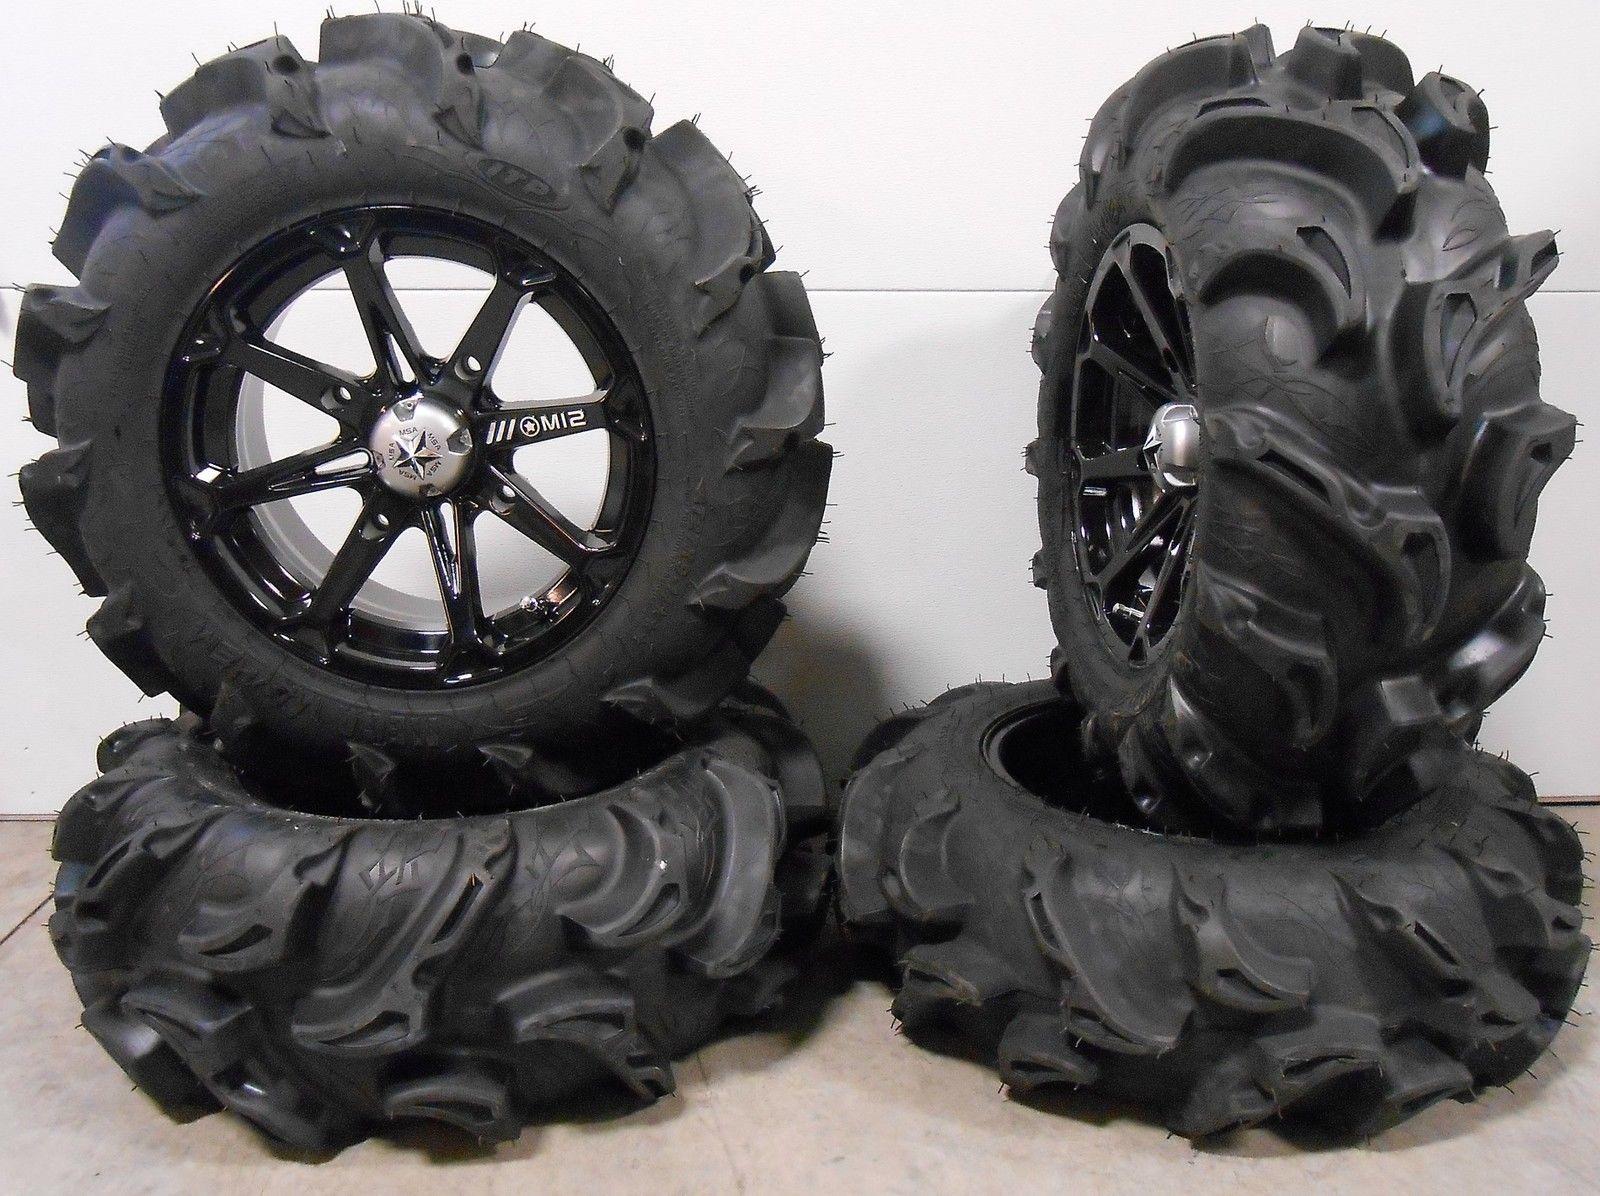 Msa Black Diesel 14 Atv Wheels 27 Mega Mayhem Tires Honda Foreman Rancher Sra Ebay Atv Wheels Black Diesel Best Tire Shine